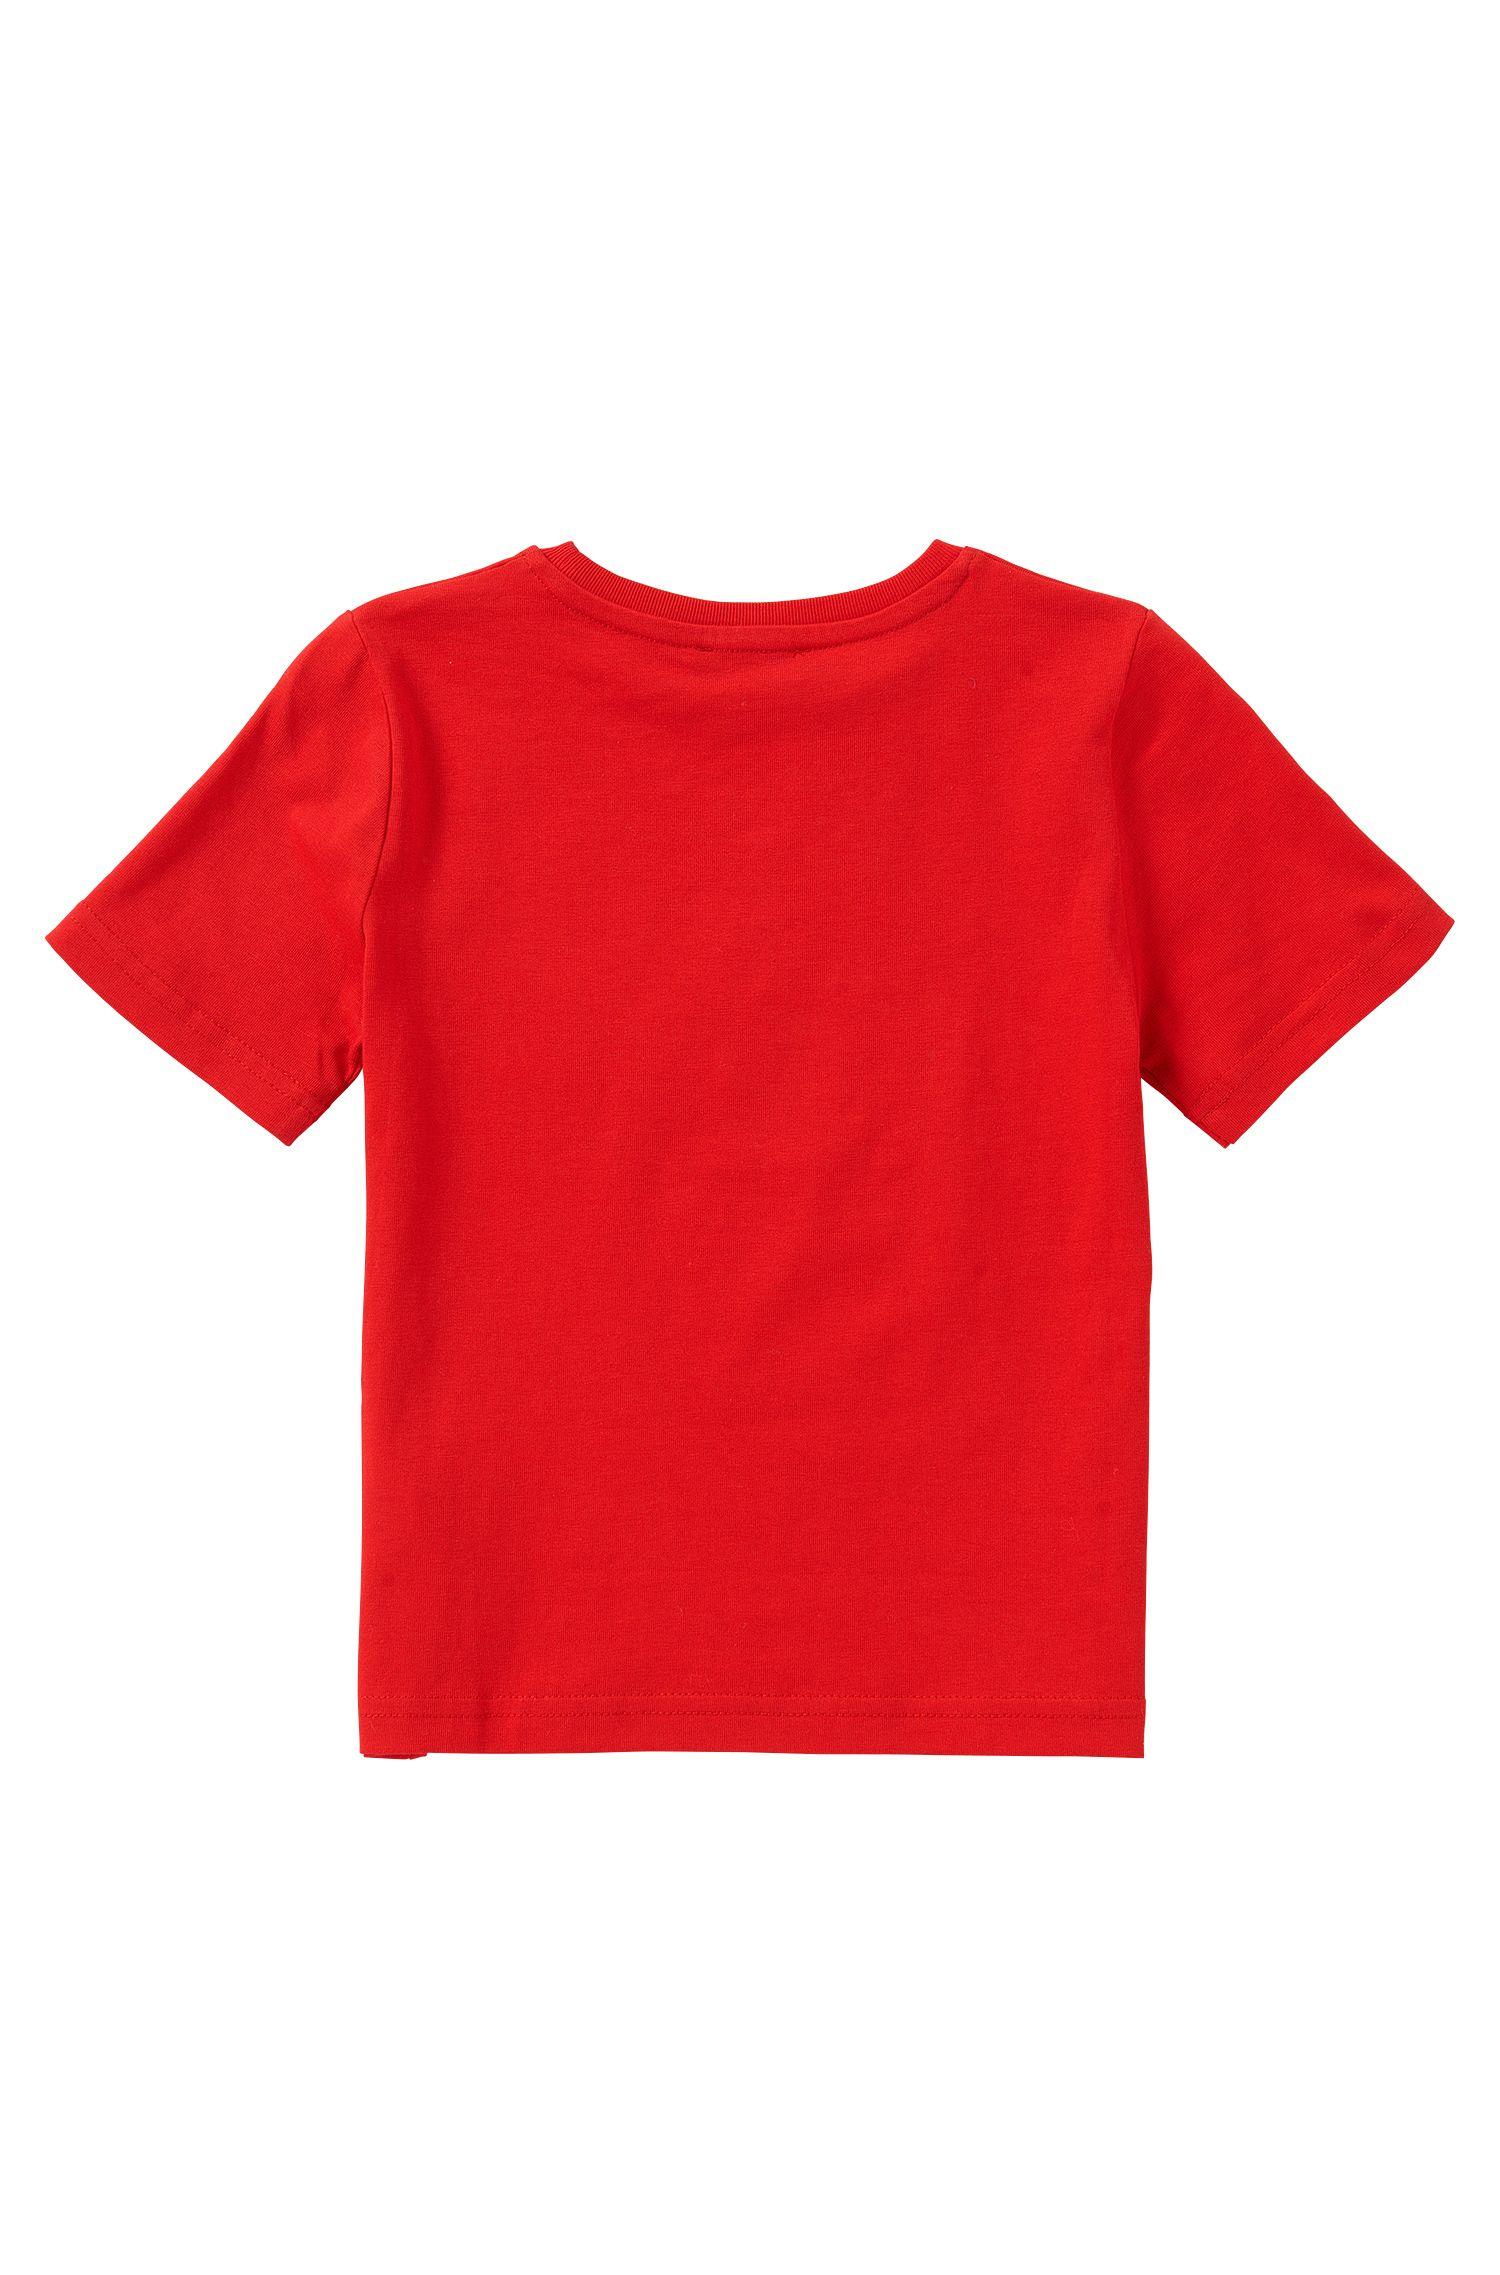 Regular-fit kinder-T-shirt van katoen: 'J25U00'